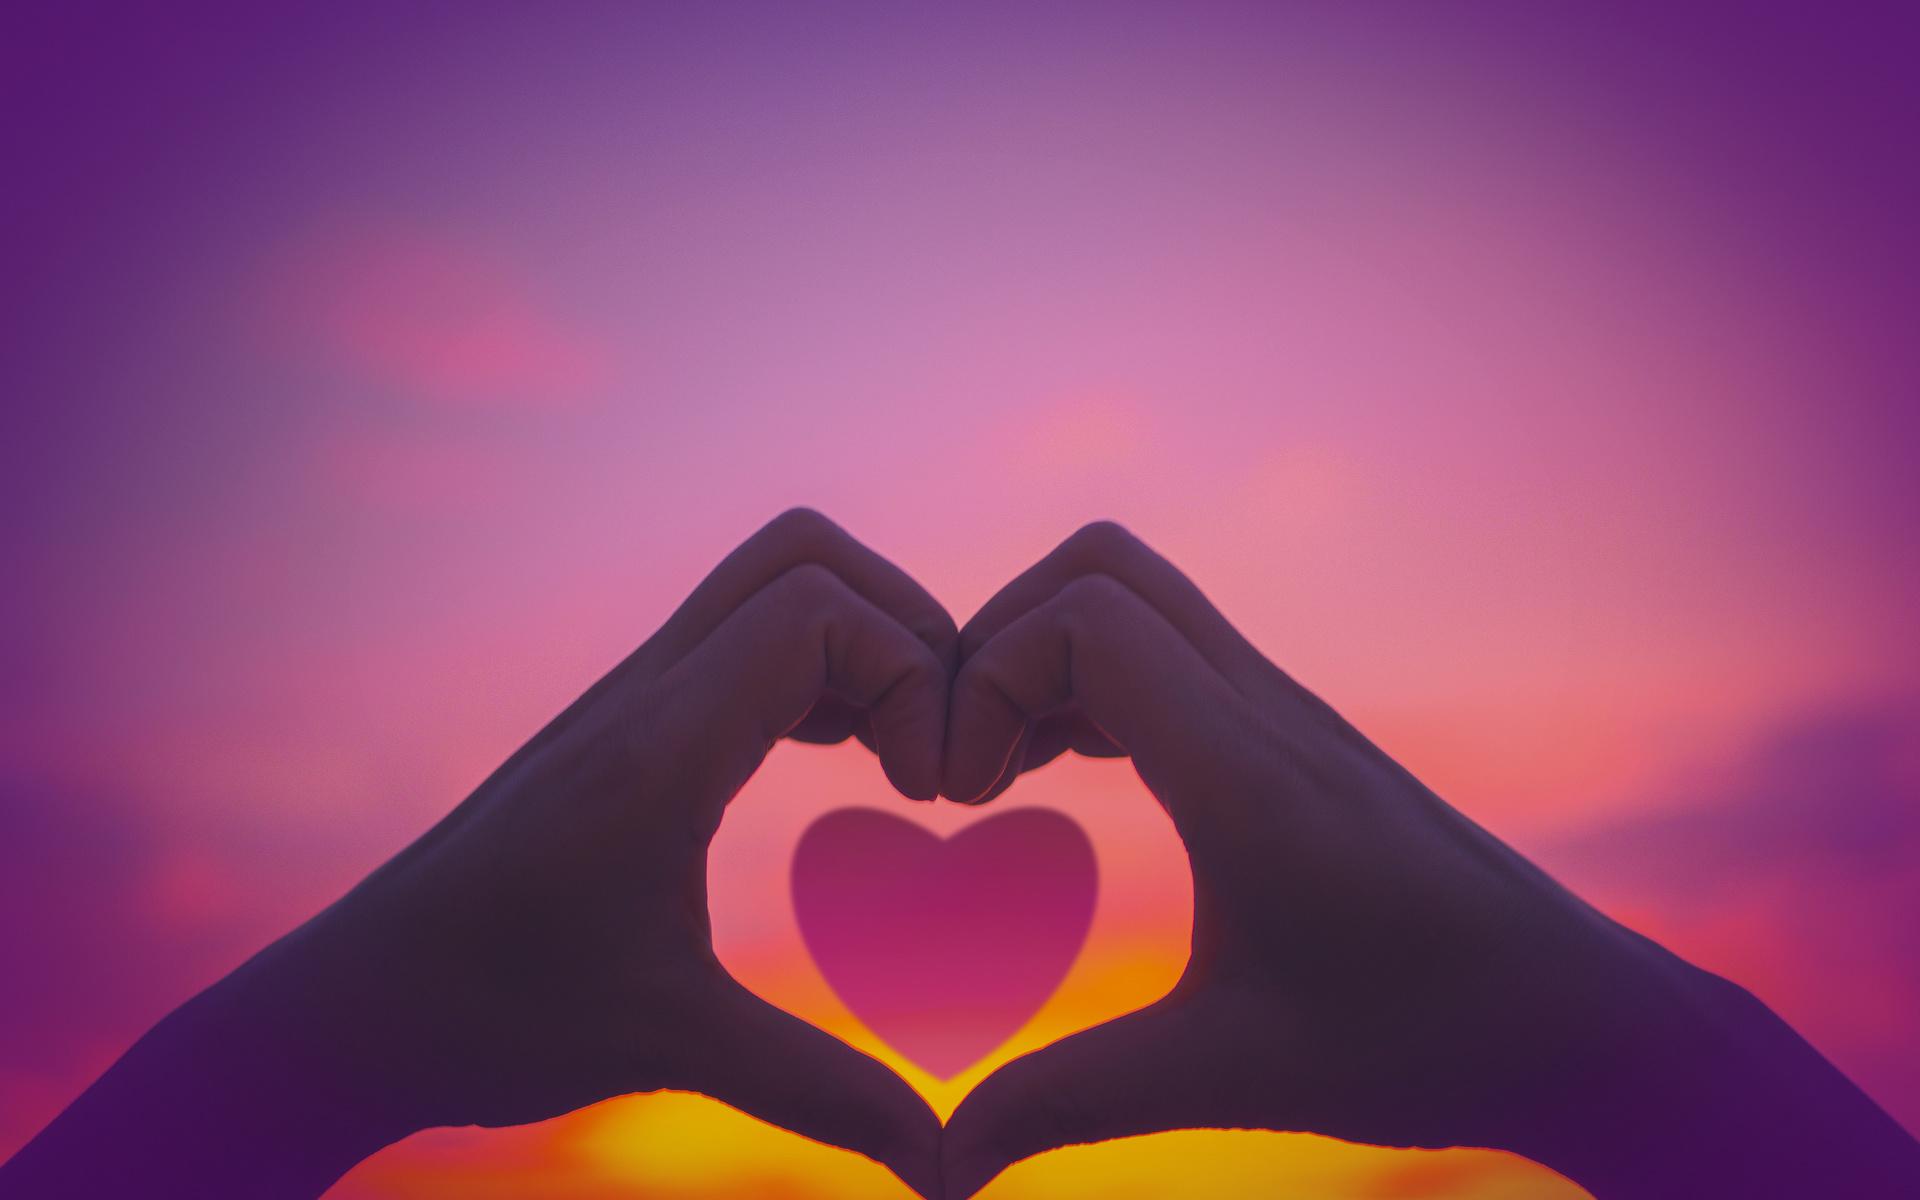 гвоздик картинки с сердцами друг друга названия сразу понятно